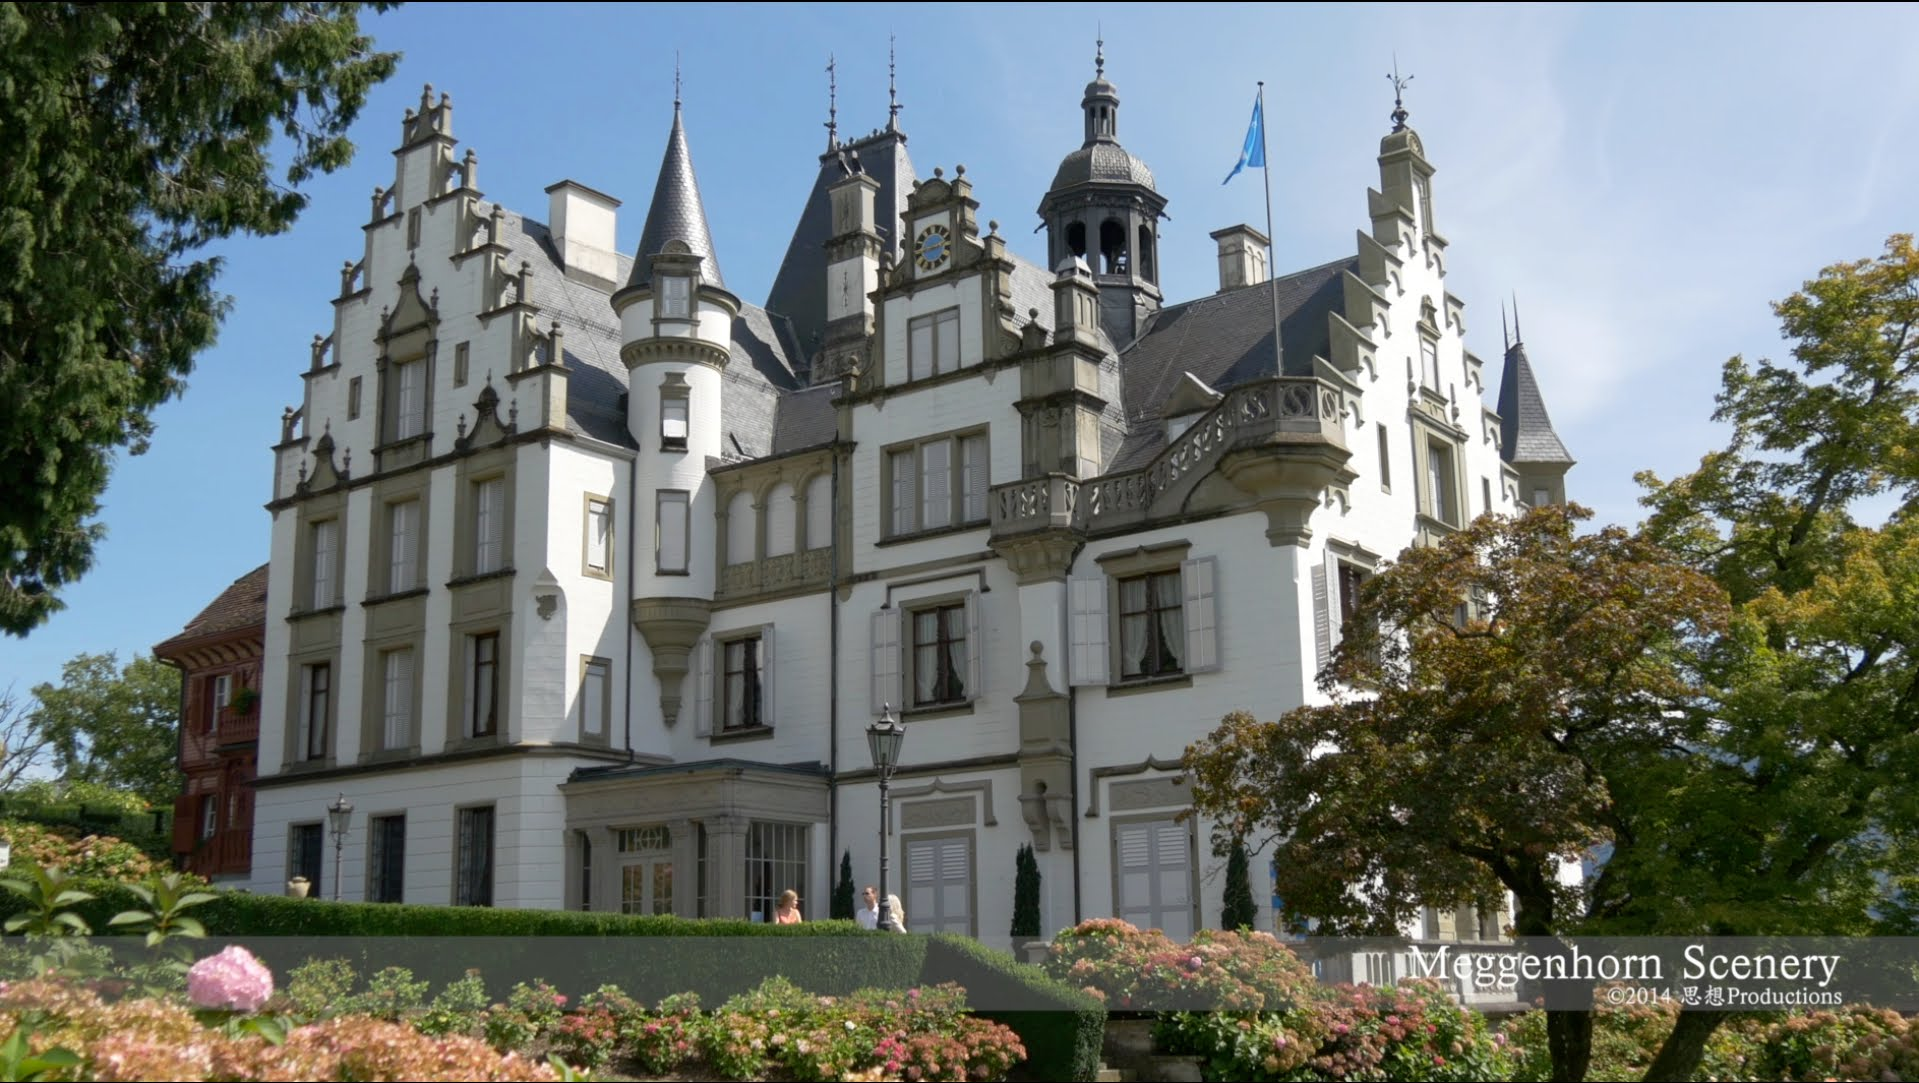 Schloss Meggenhorn Castle, Luzern SWITZERLAND 城 スイス - YouTube